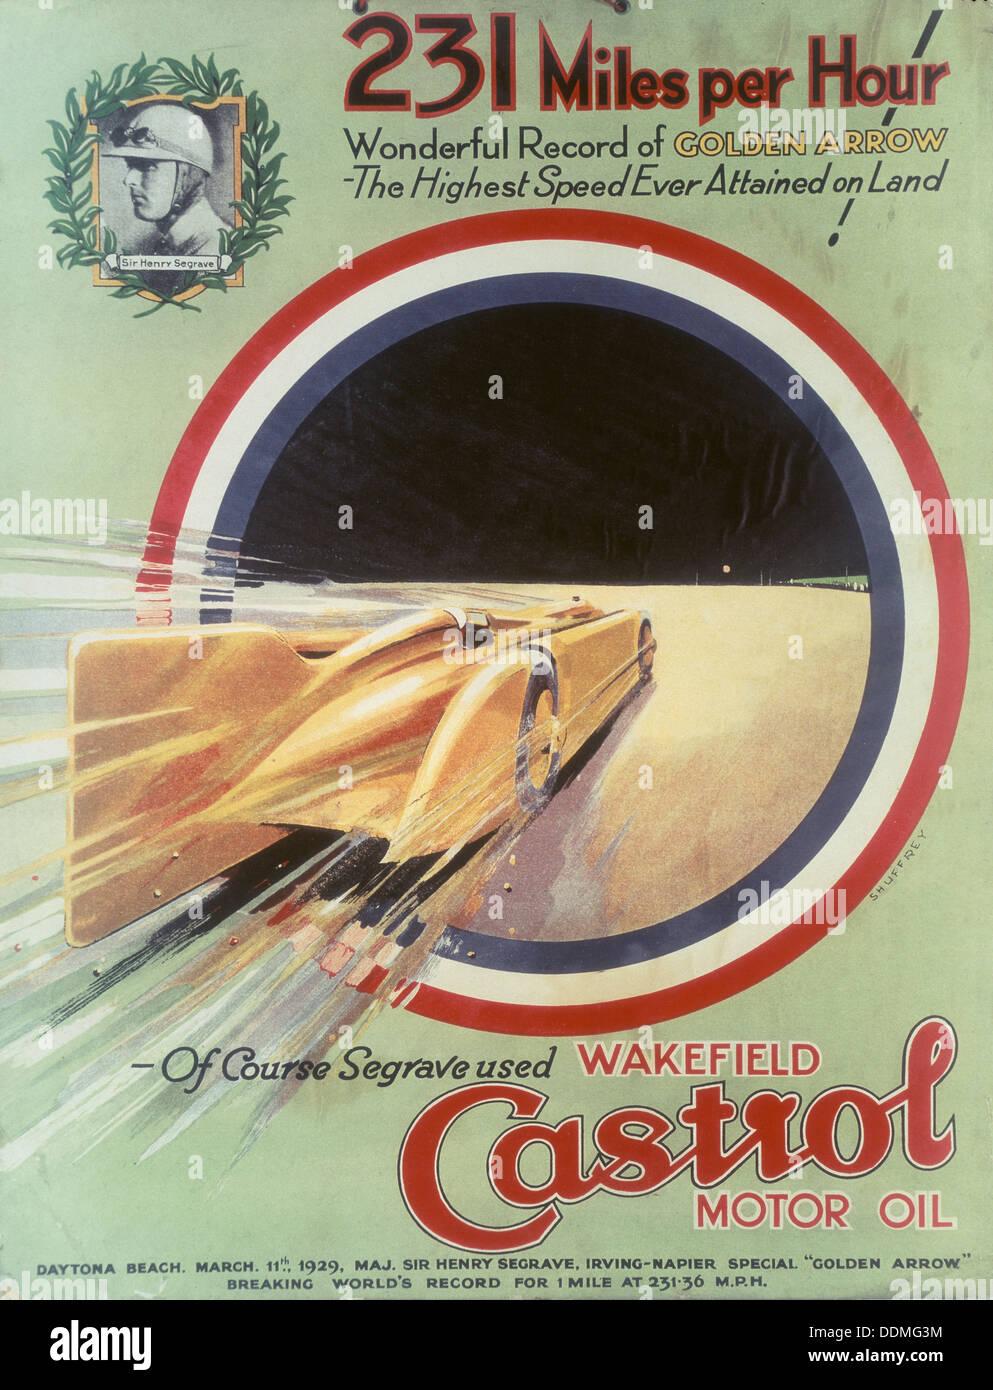 Castrol Motoröl Plakatwerbung. Stockbild